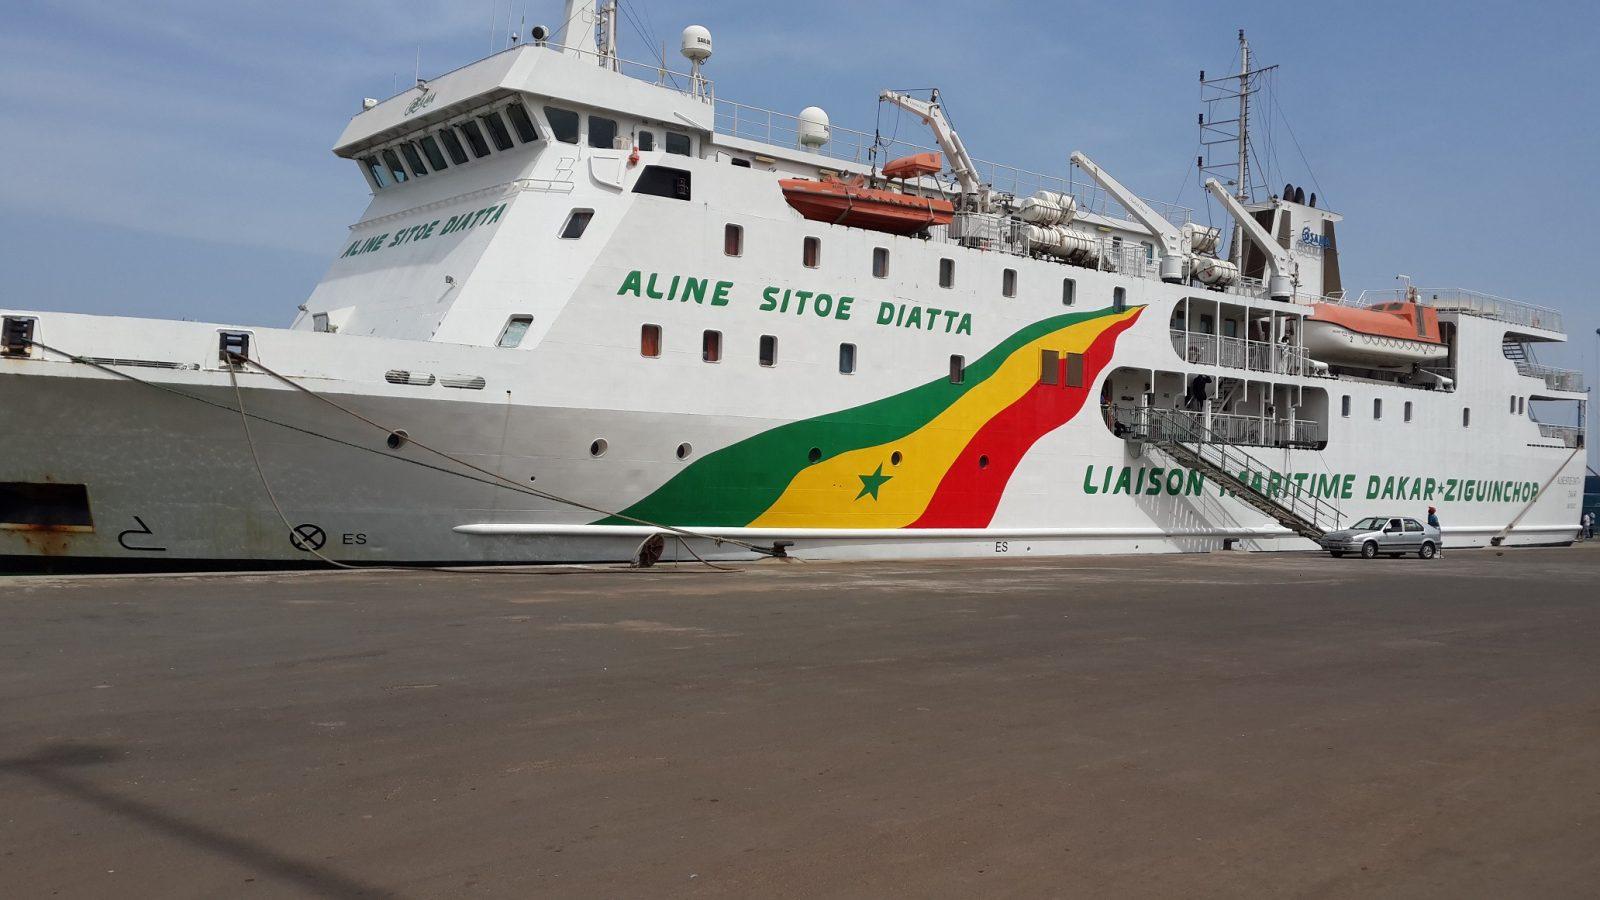 Le bateau Aline Sitoé Diatta reliant Dakar à Ziguinchor - Photo : Comlanvi Mawulolo